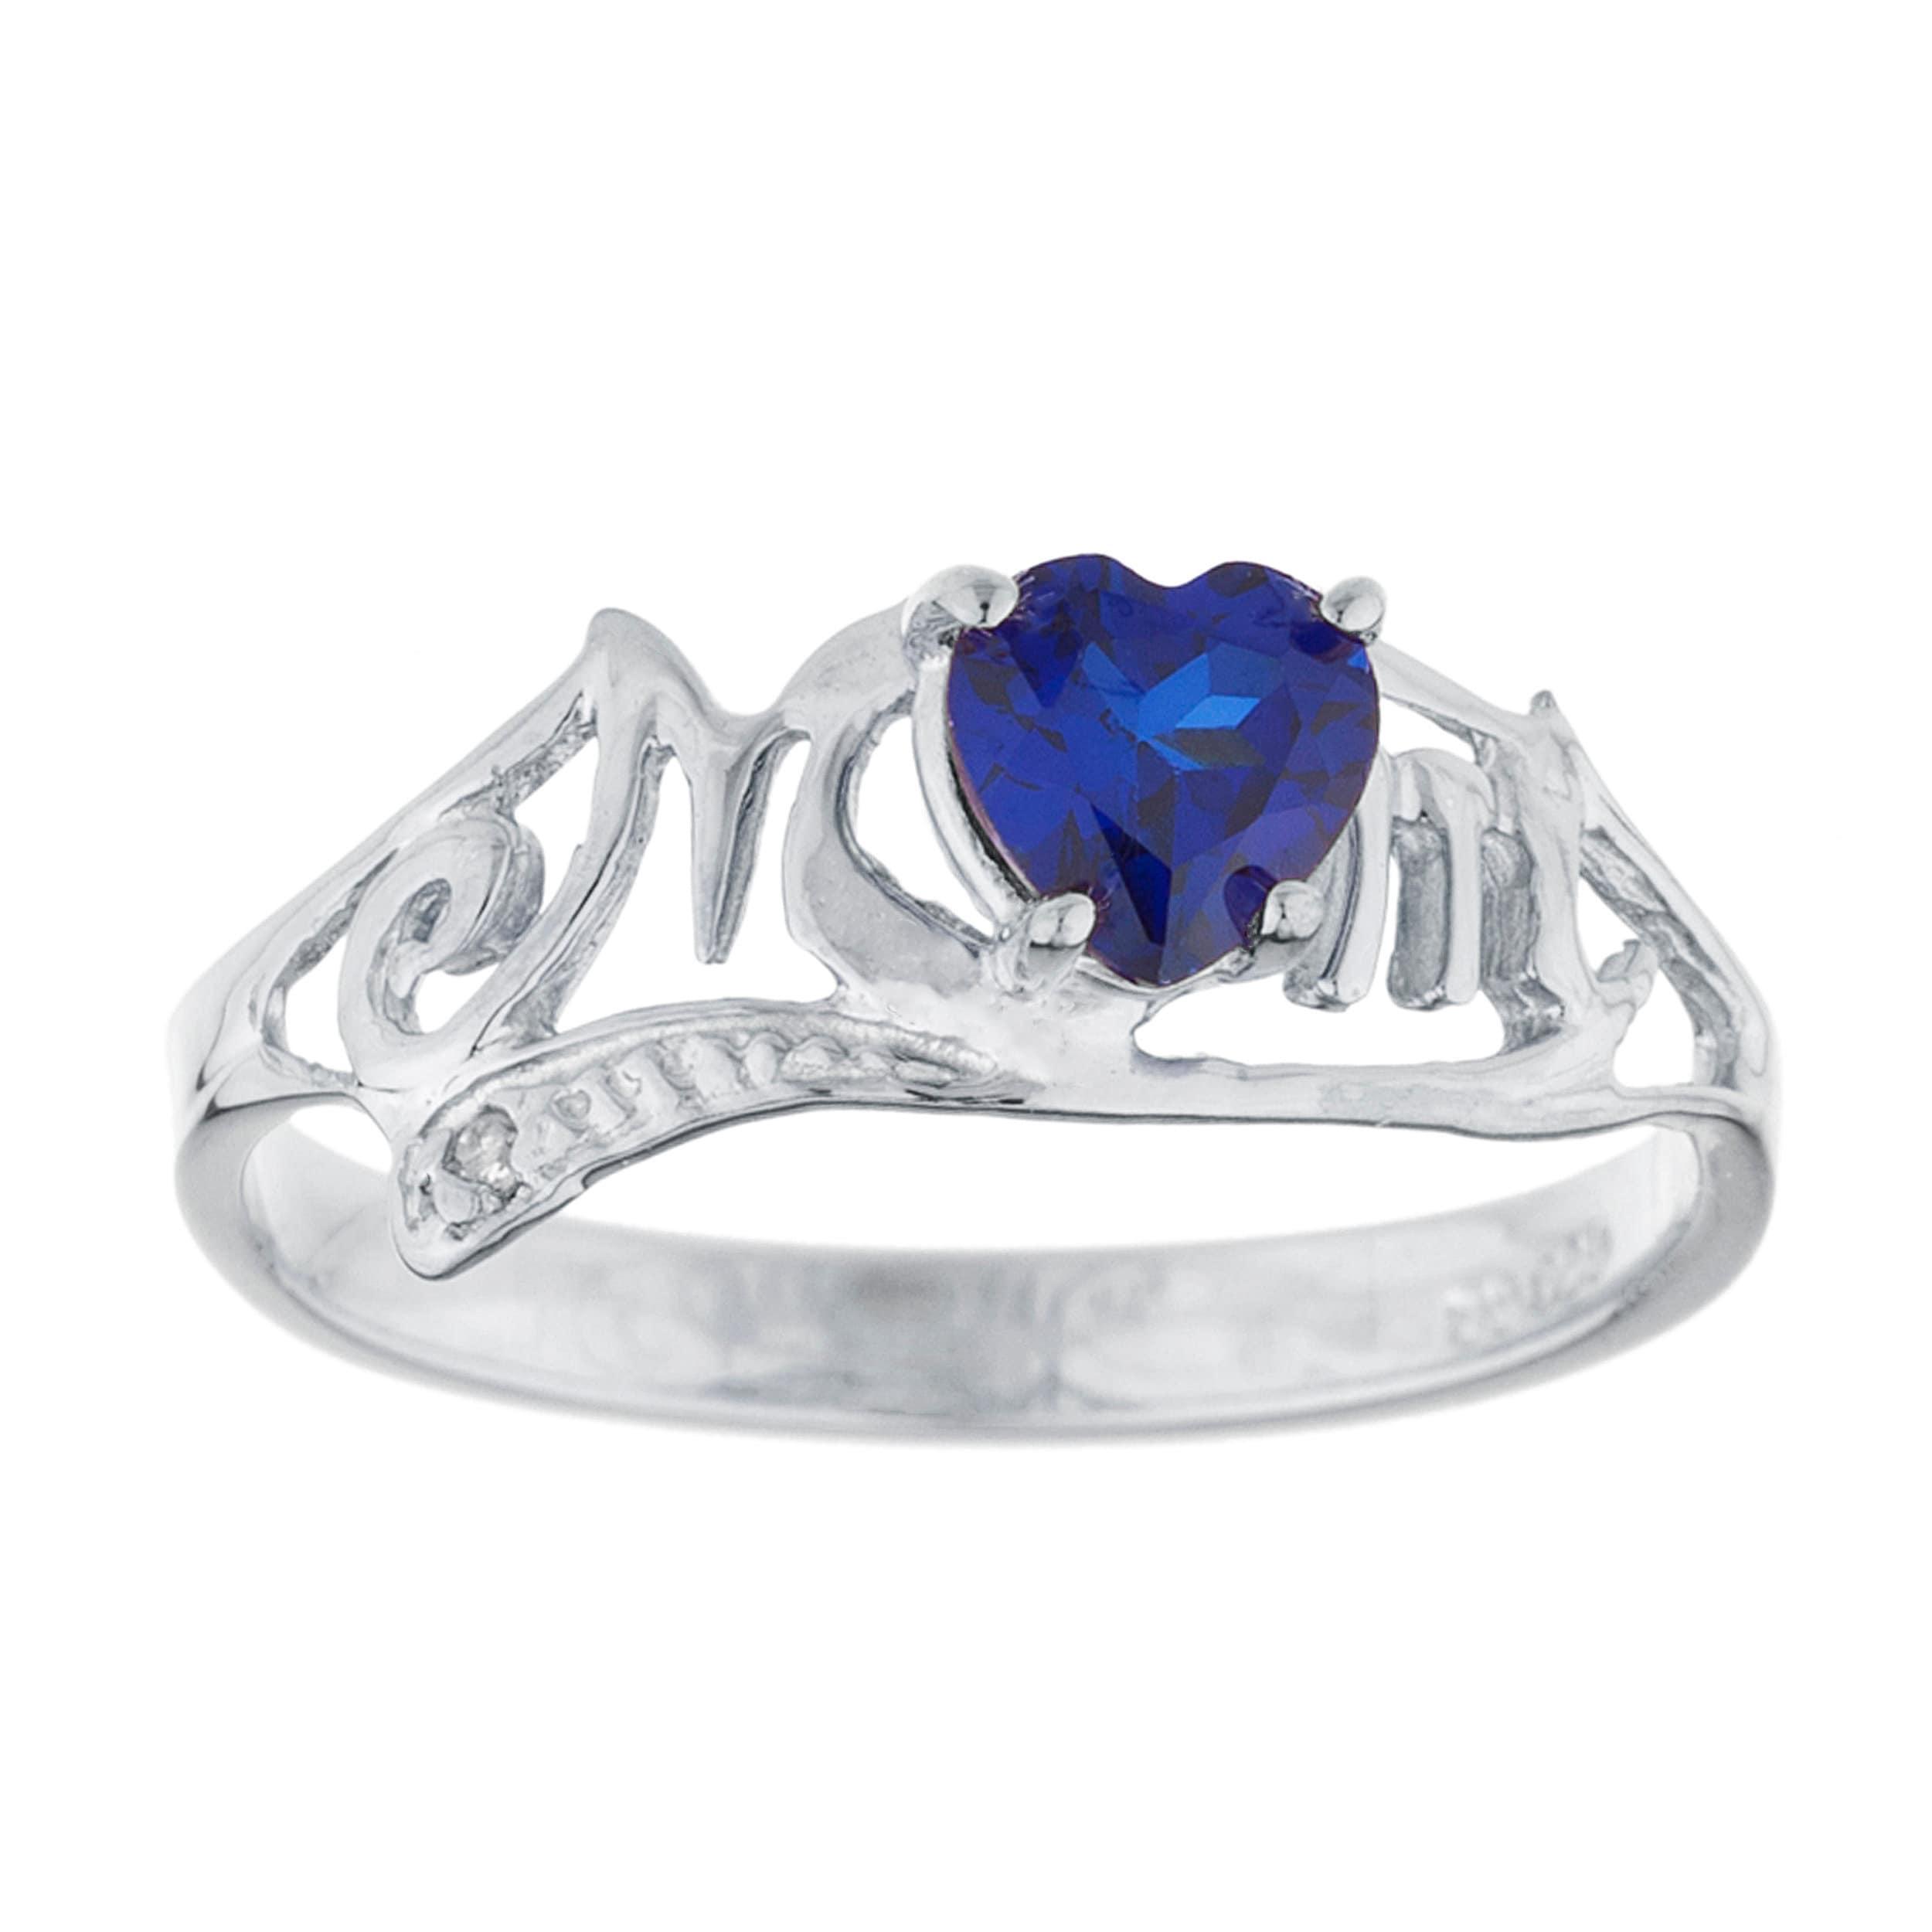 1 Ct Created Blue Sapphire /& Diamond Round Stud Earrings .925 Sterling Silver Rhodium Finish